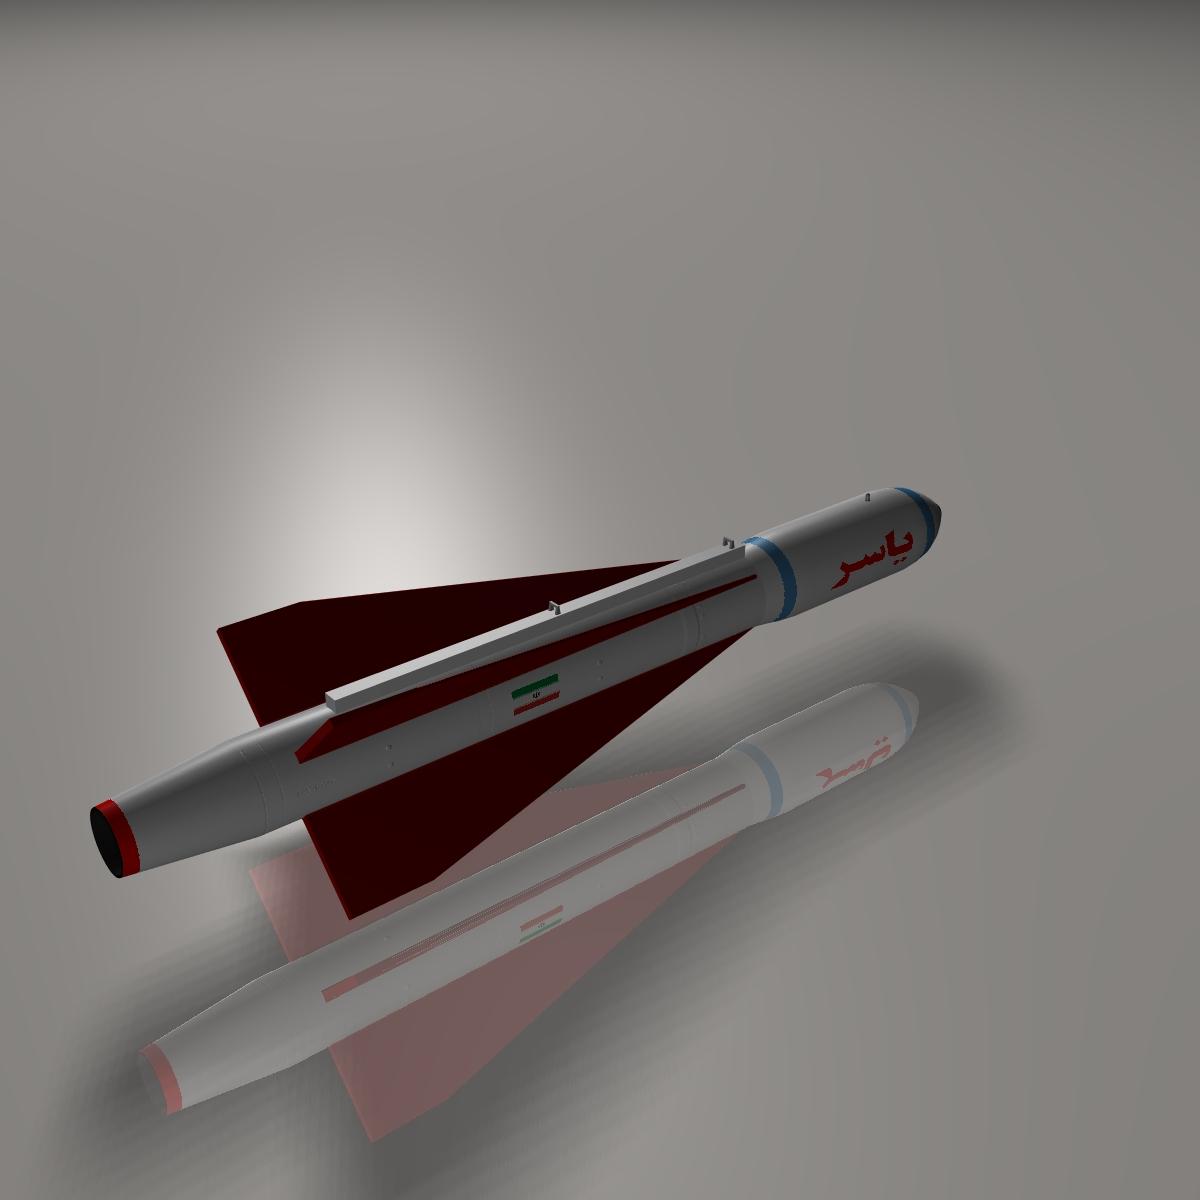 iran yasser asm raketi 3d modeli 3ds dxf cob x obj 150571